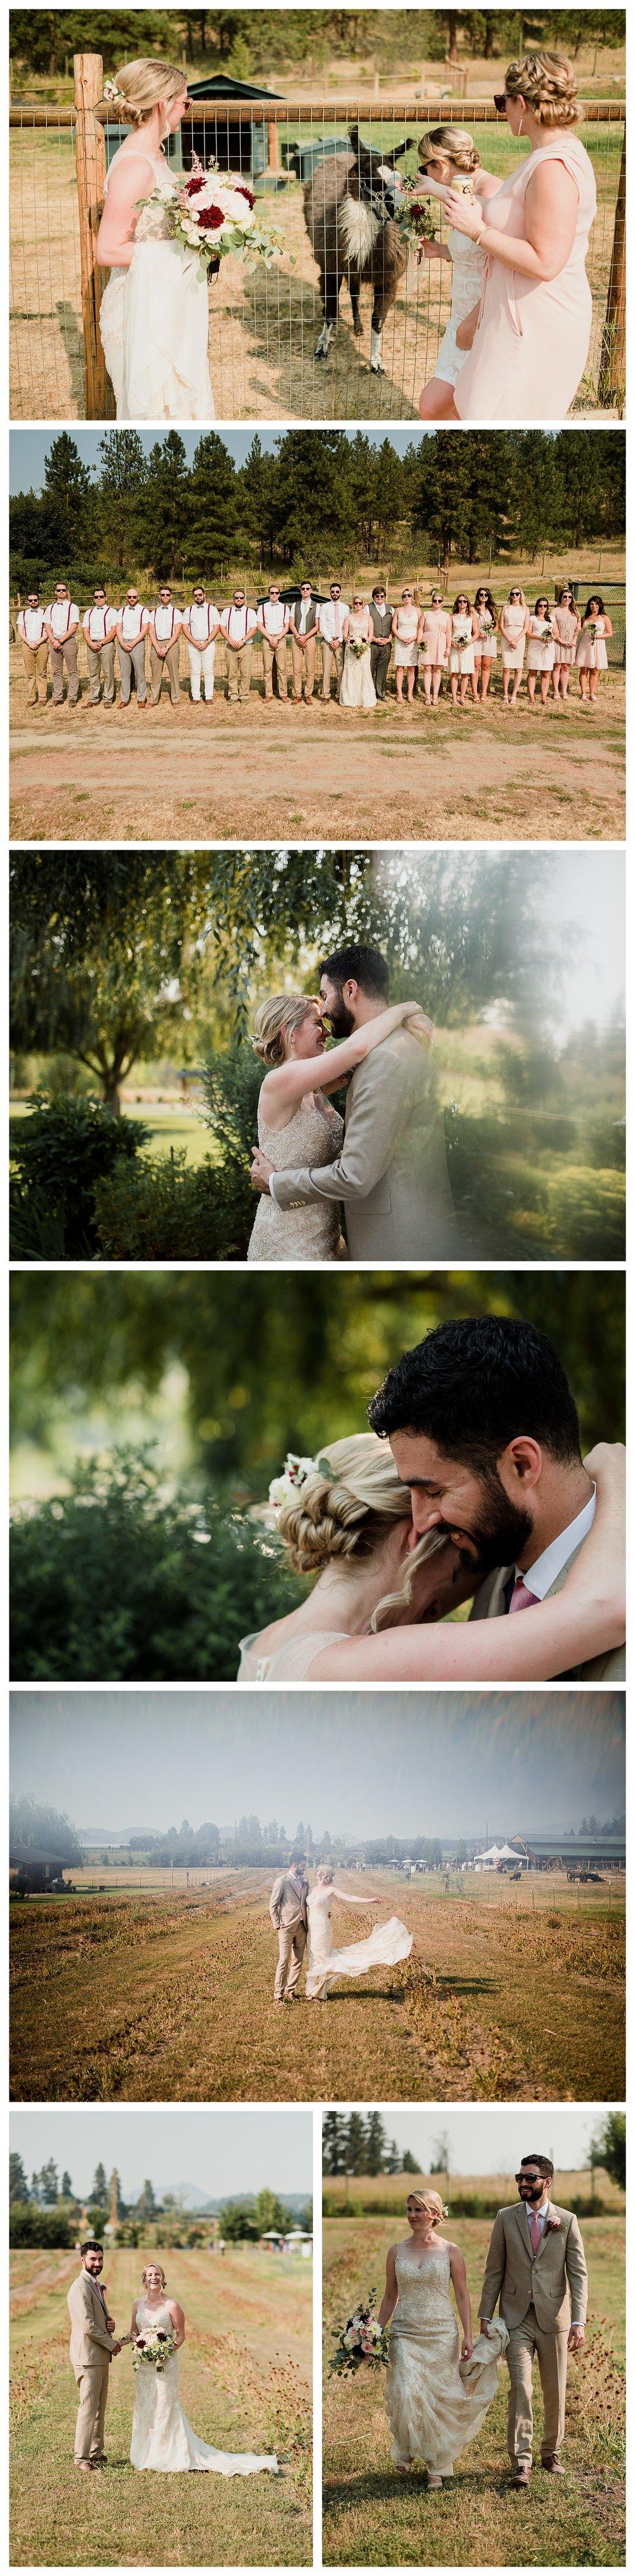 Falcon Ridge Wedding photographer in Kelowna, Canada.